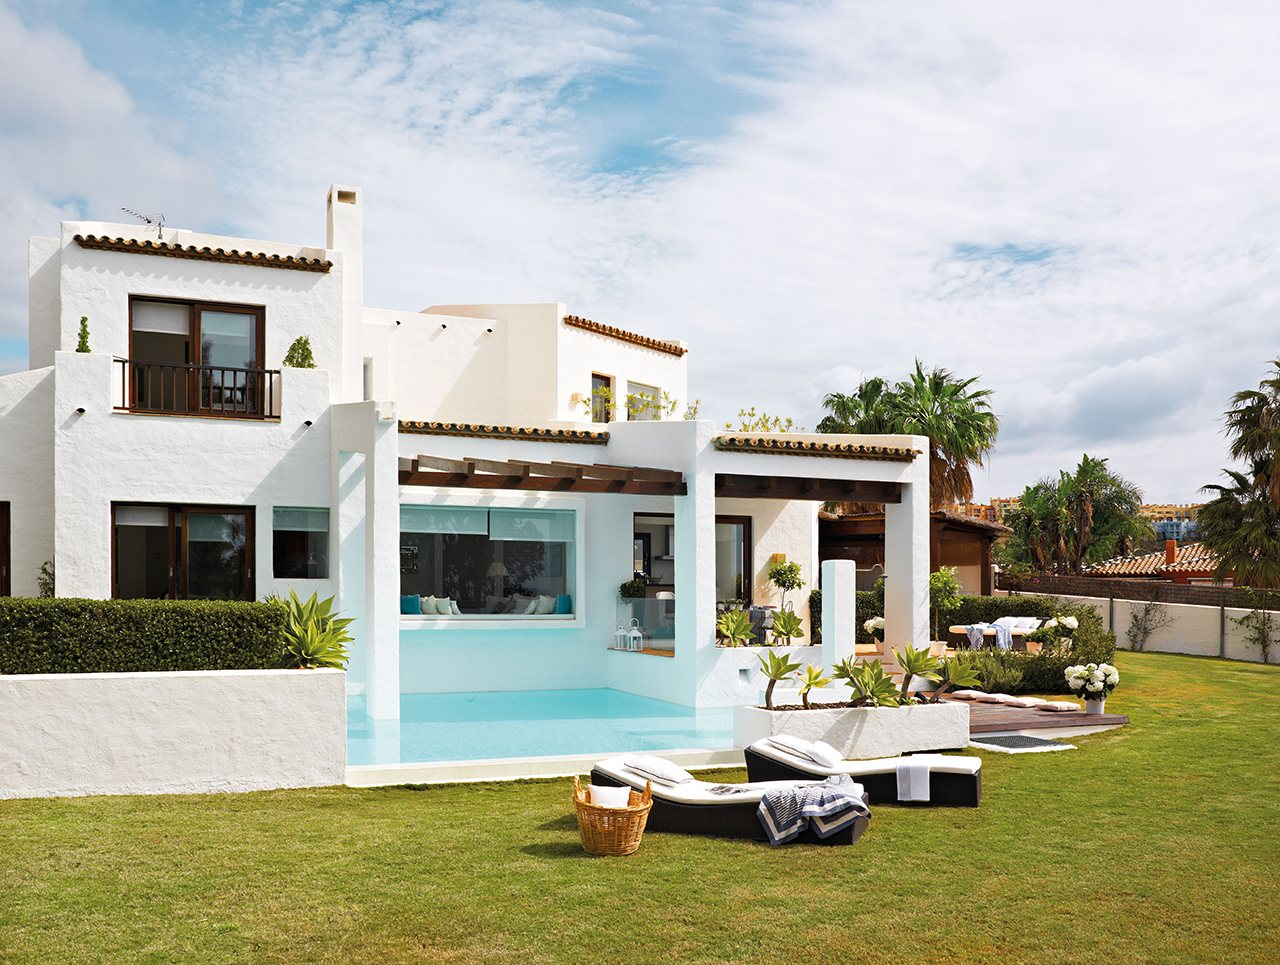 Una casa fresca de esencia andaluza for Fotos de fachadas de casas andaluzas